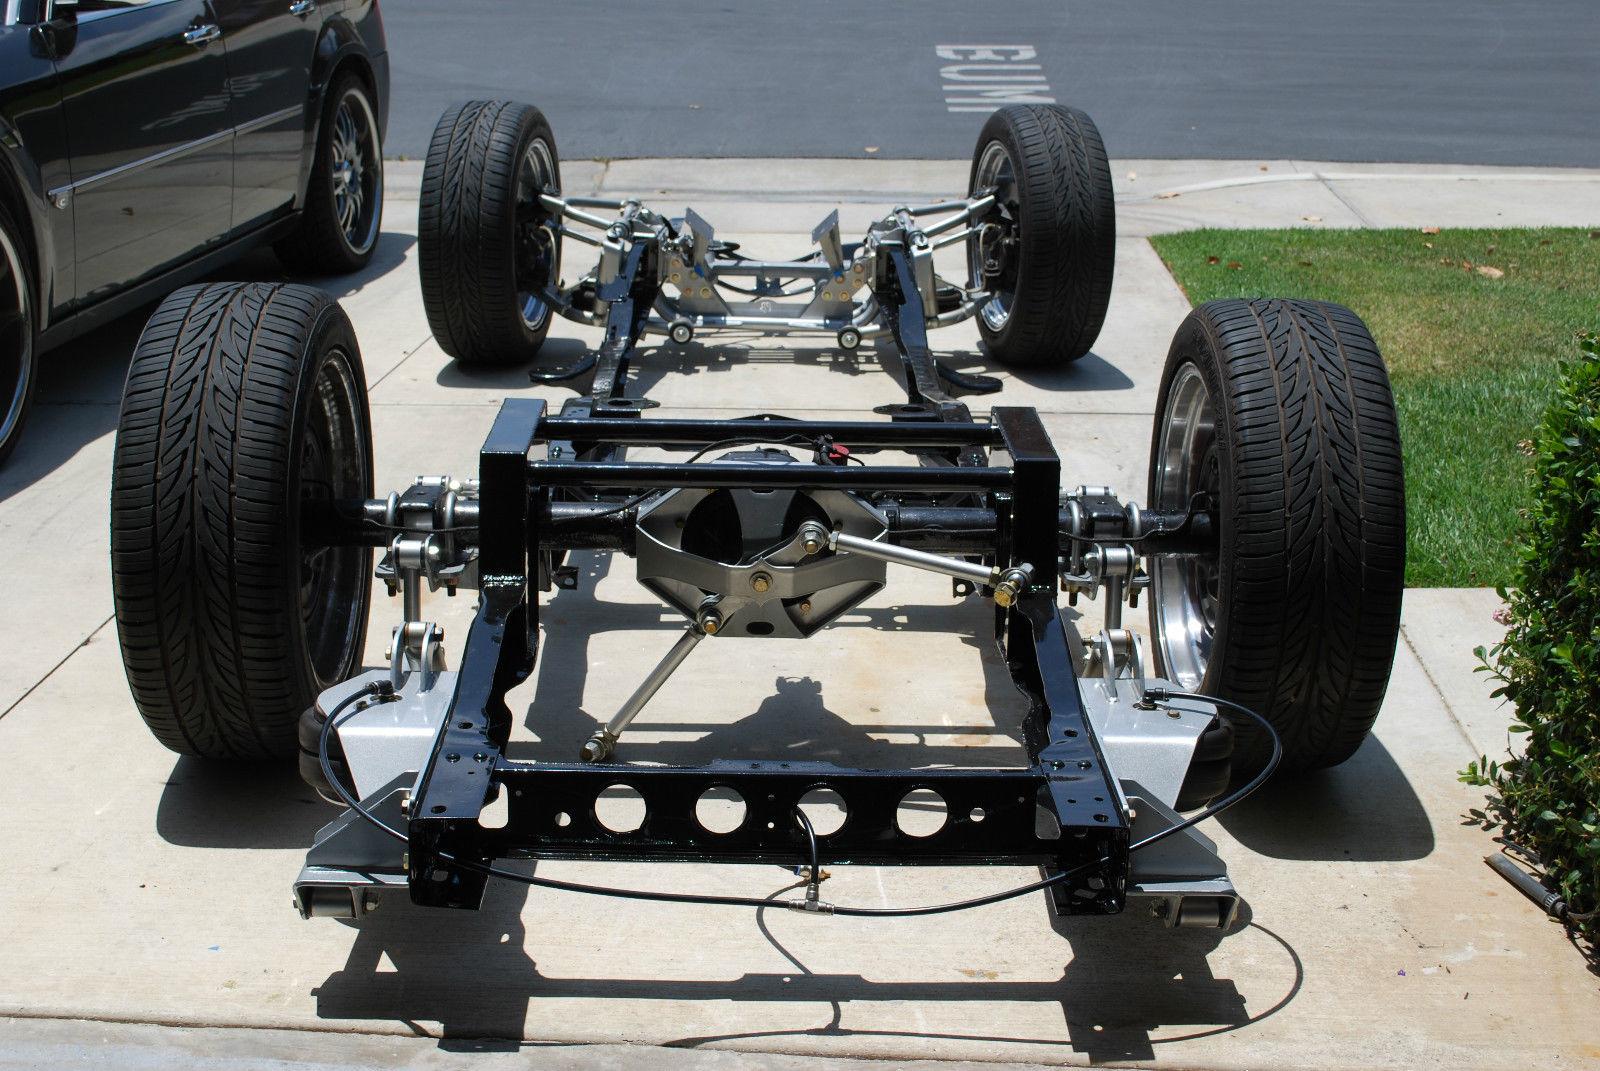 84 Chevy C10 5 3 Swap Bagged Ridetech Porterbuilt Accuair